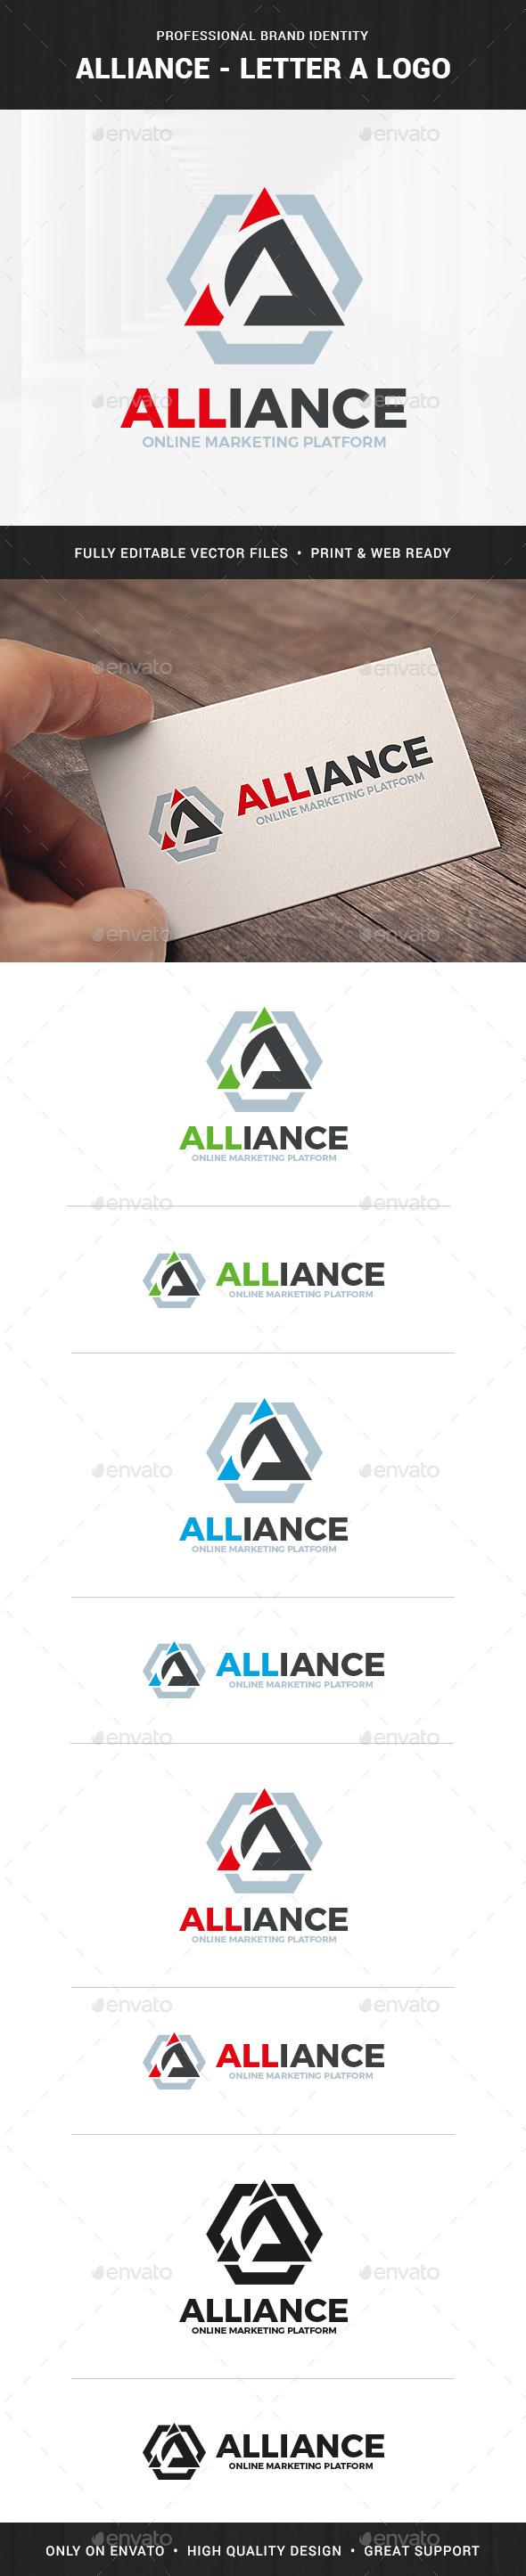 Alliance - Letter A Logo